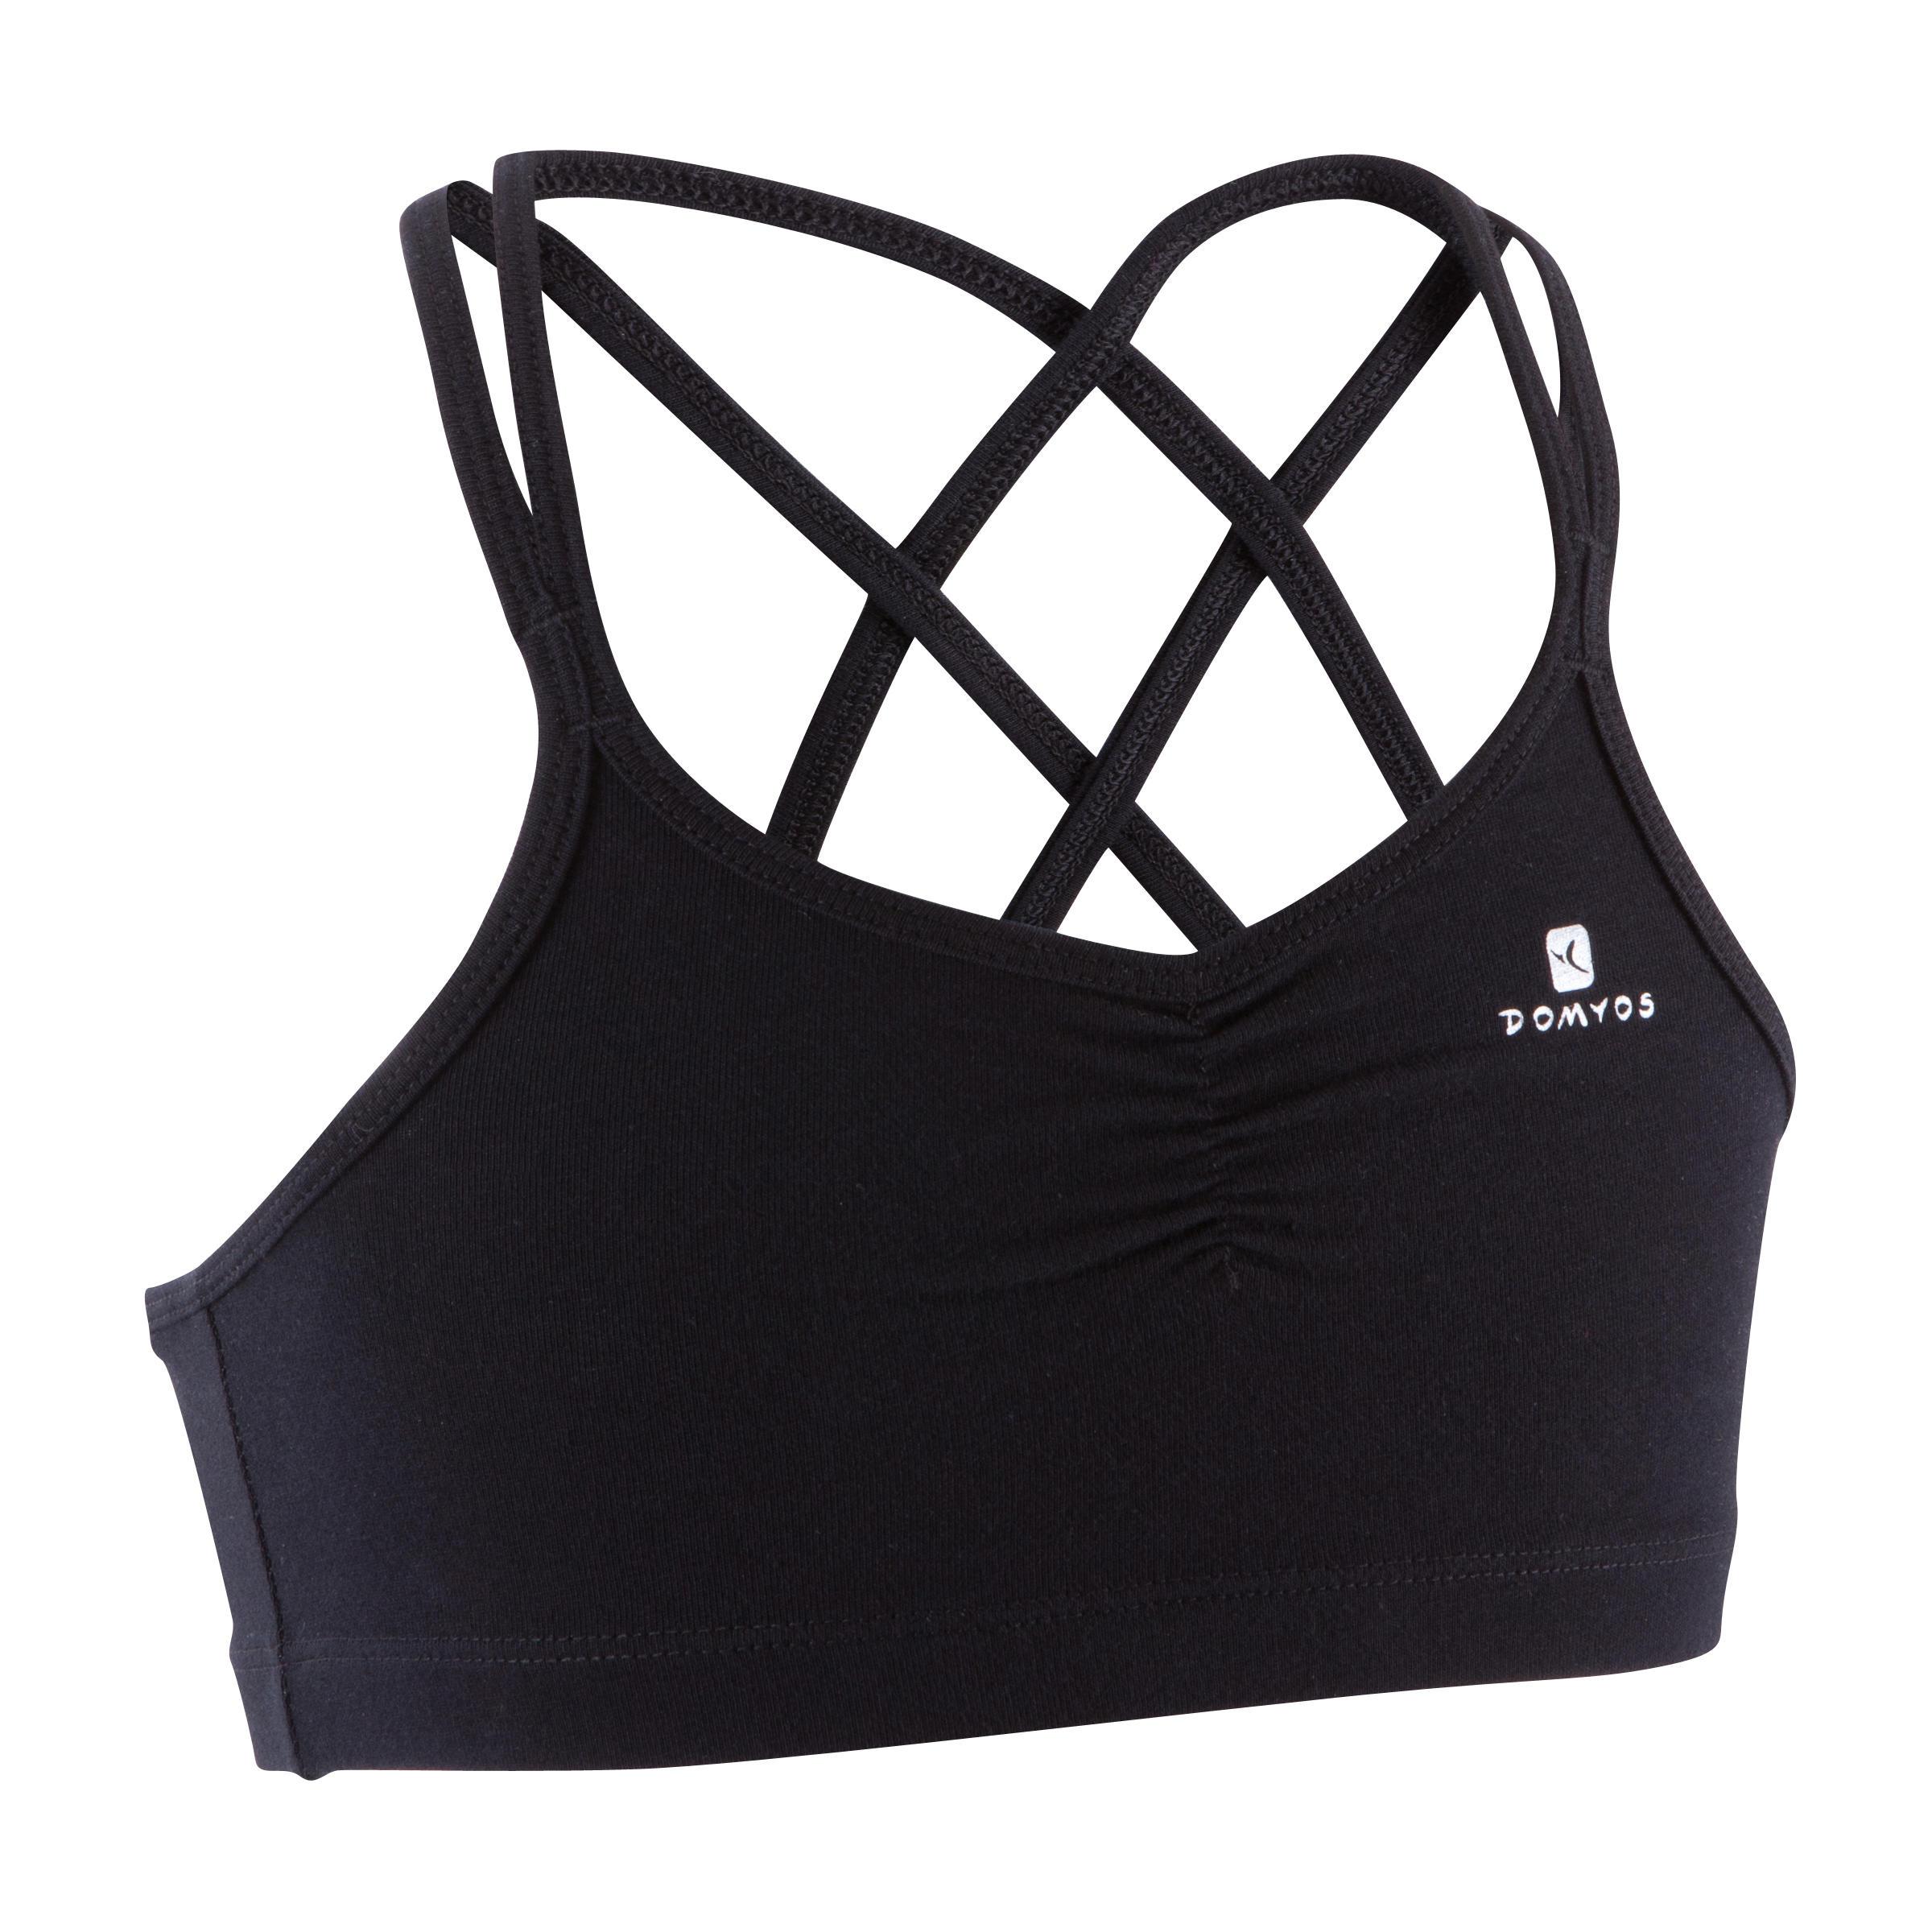 Girls' Dance Sports Bra with Thin Crossover Straps - Black